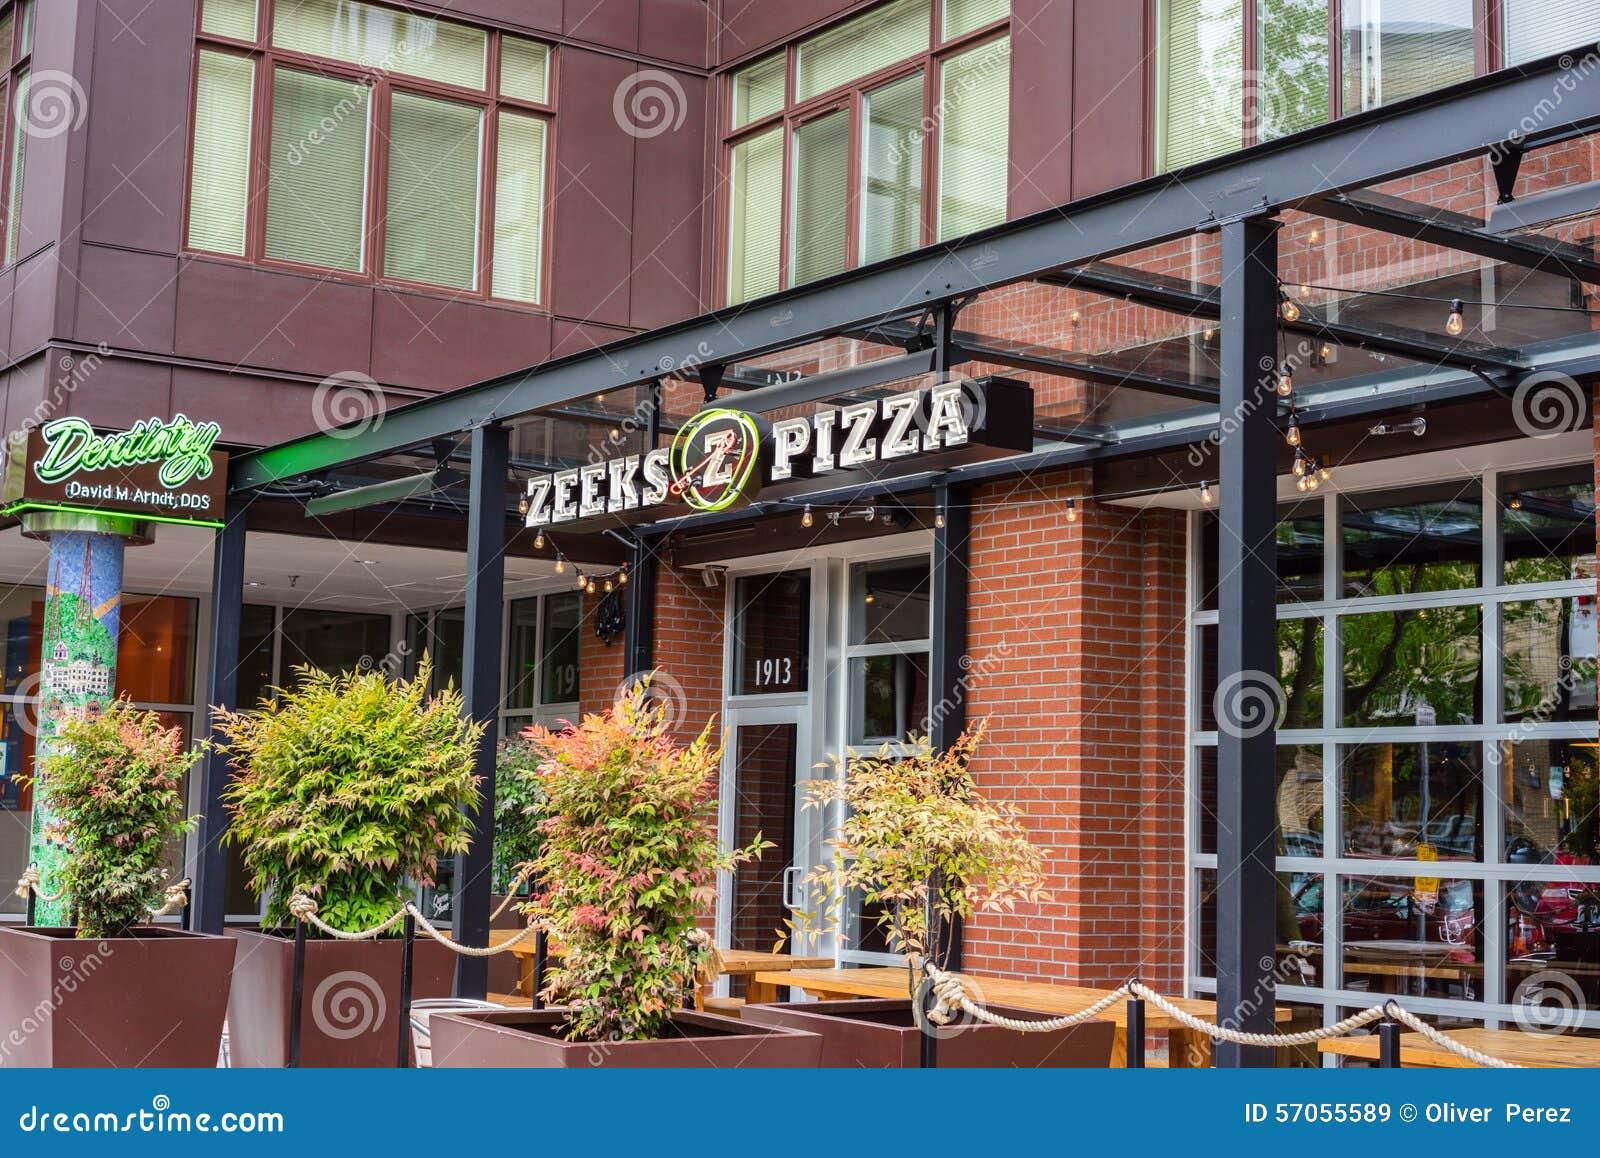 Zeekspizza